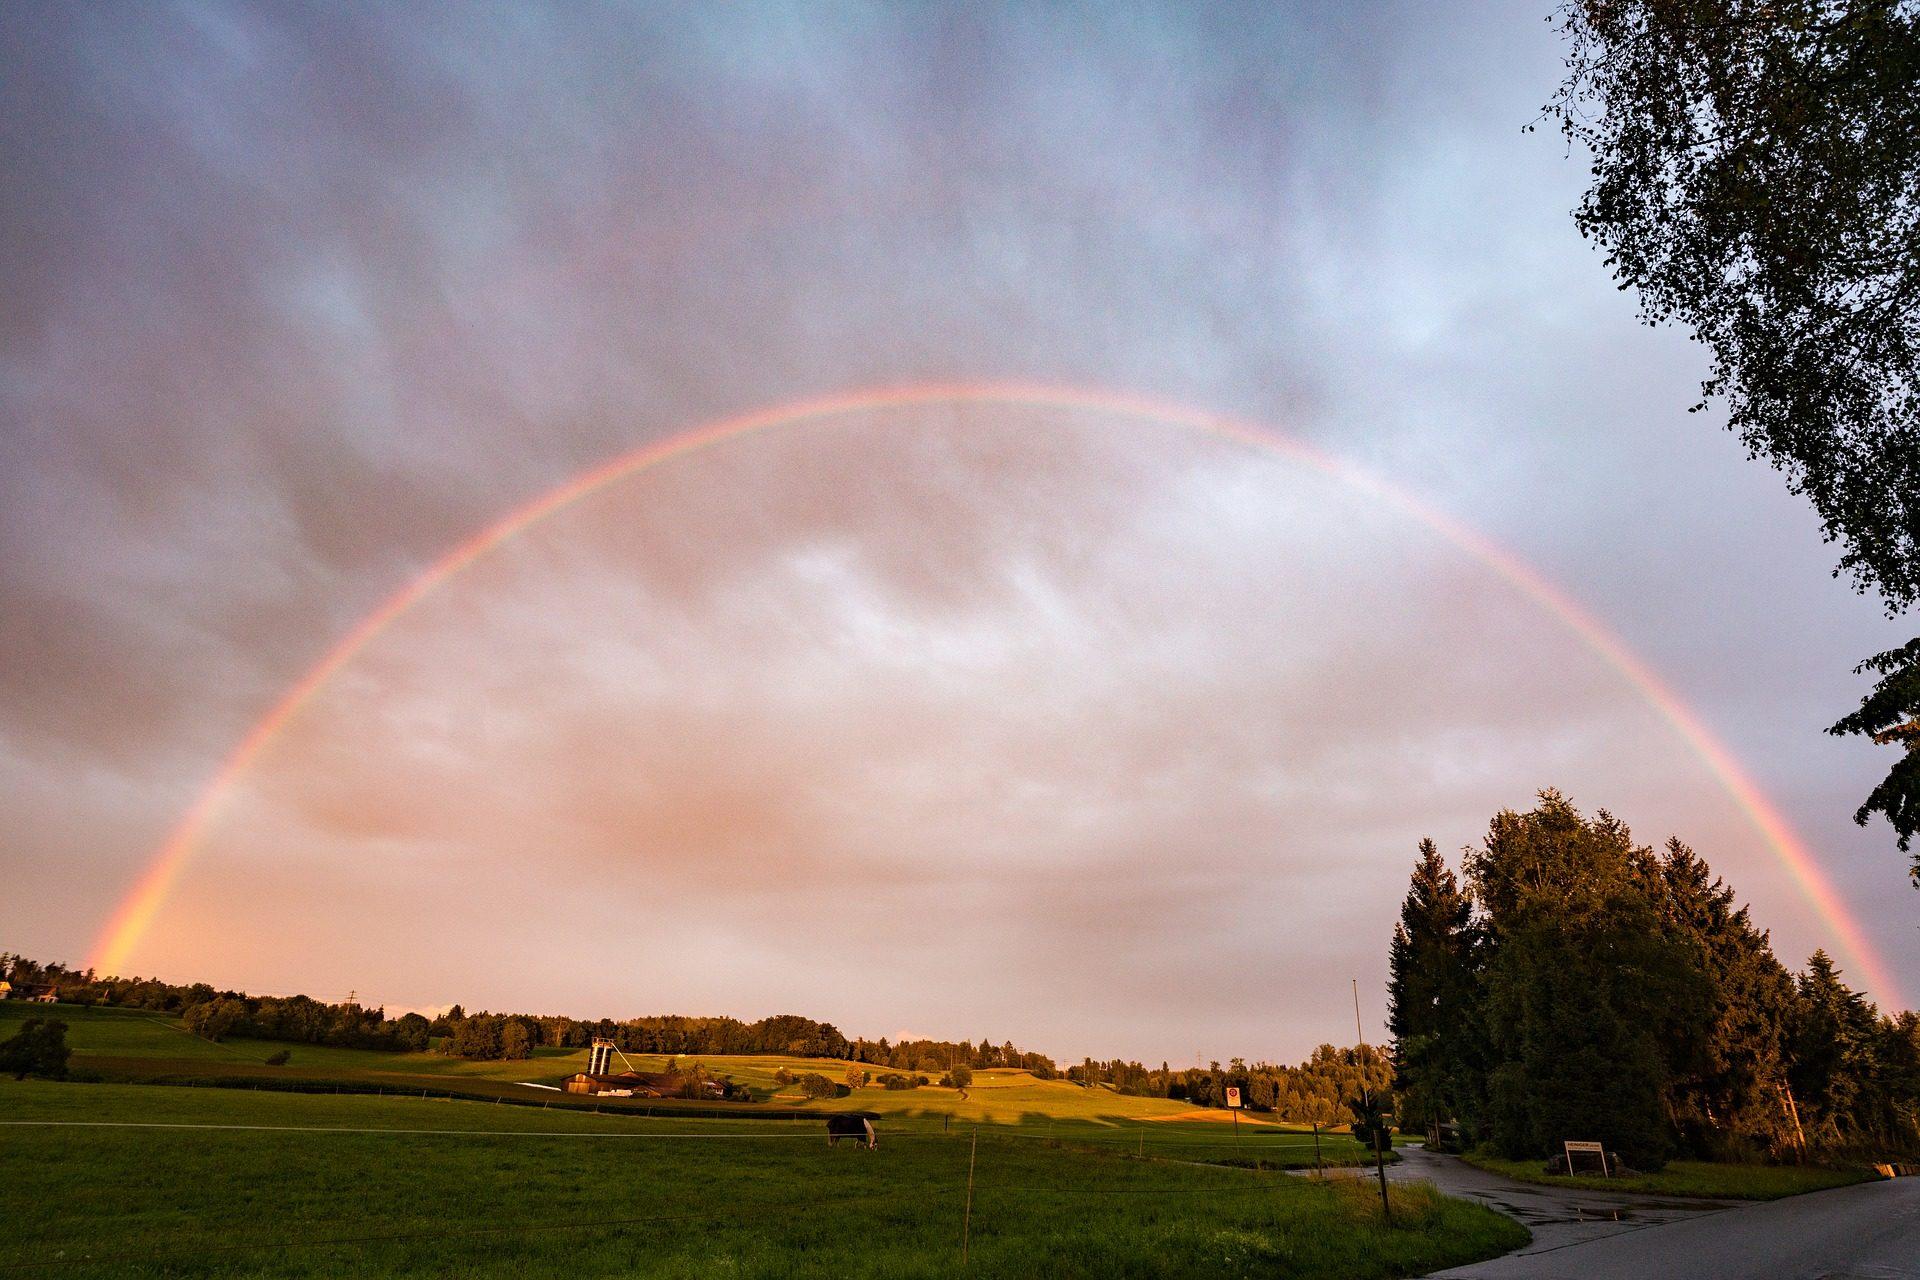 PRADO, Bäume, Regenbogen, Wolken, bewölkt - Wallpaper HD - Prof.-falken.com